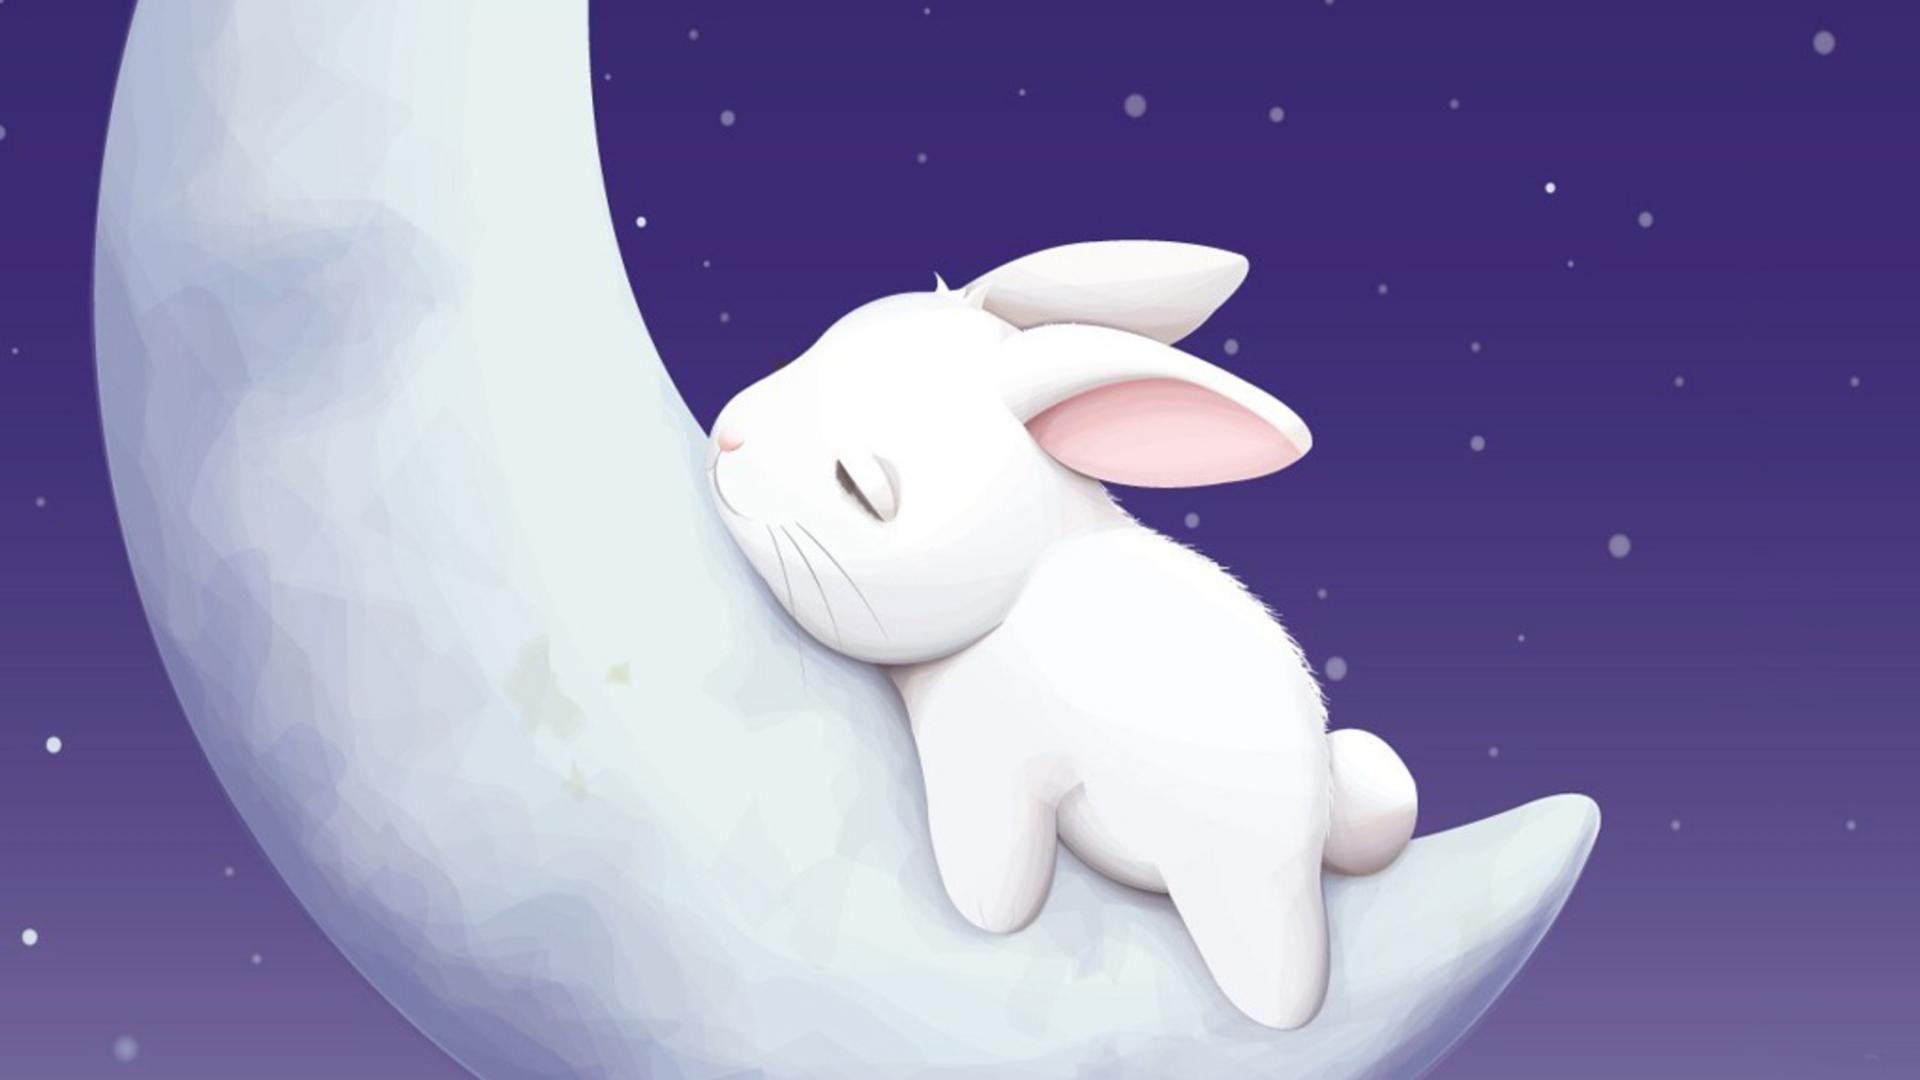 Cute Cartoon Easter Day Bunny Picture Cute Bunny Cartoon Animated Desktop Backgrounds Rabbit Wallpaper